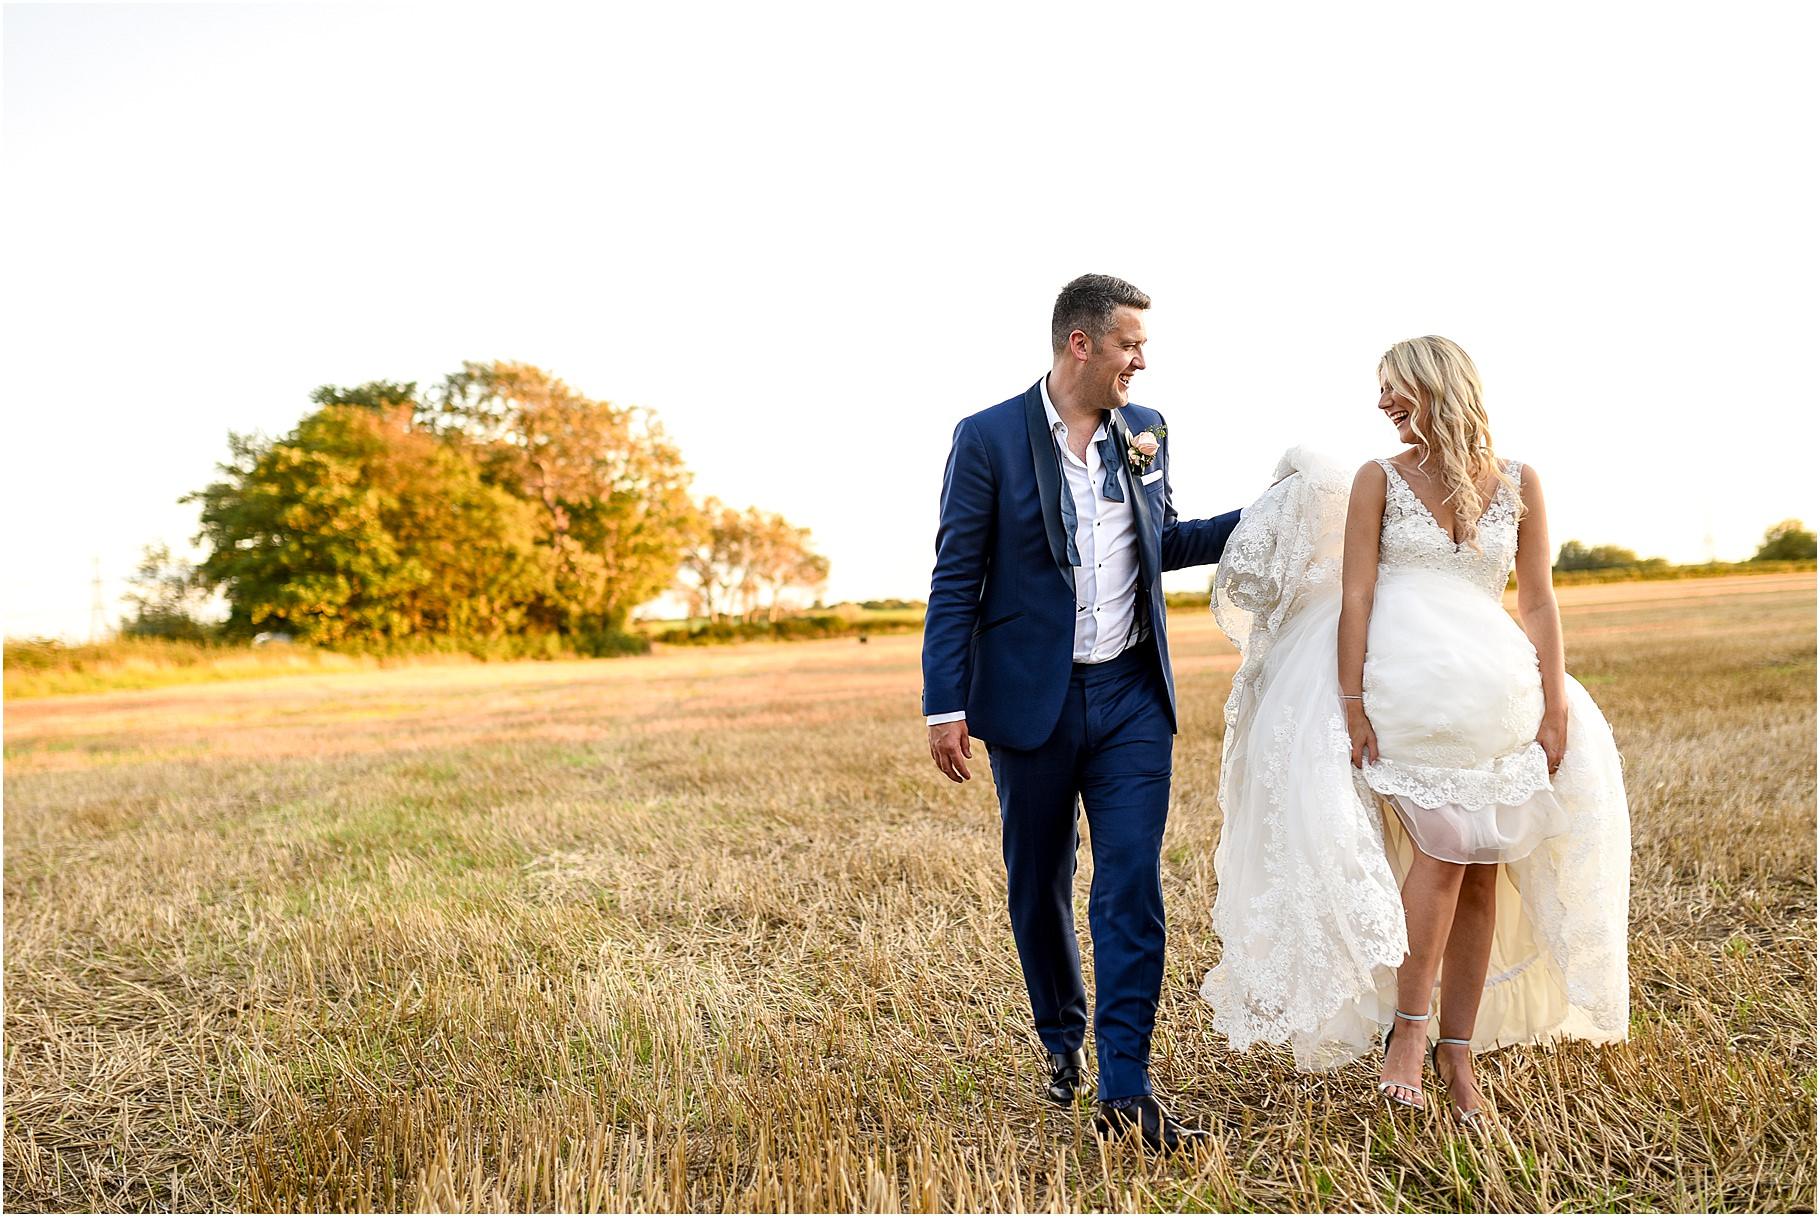 dan-wootton-photography-2017-weddings-127.jpg